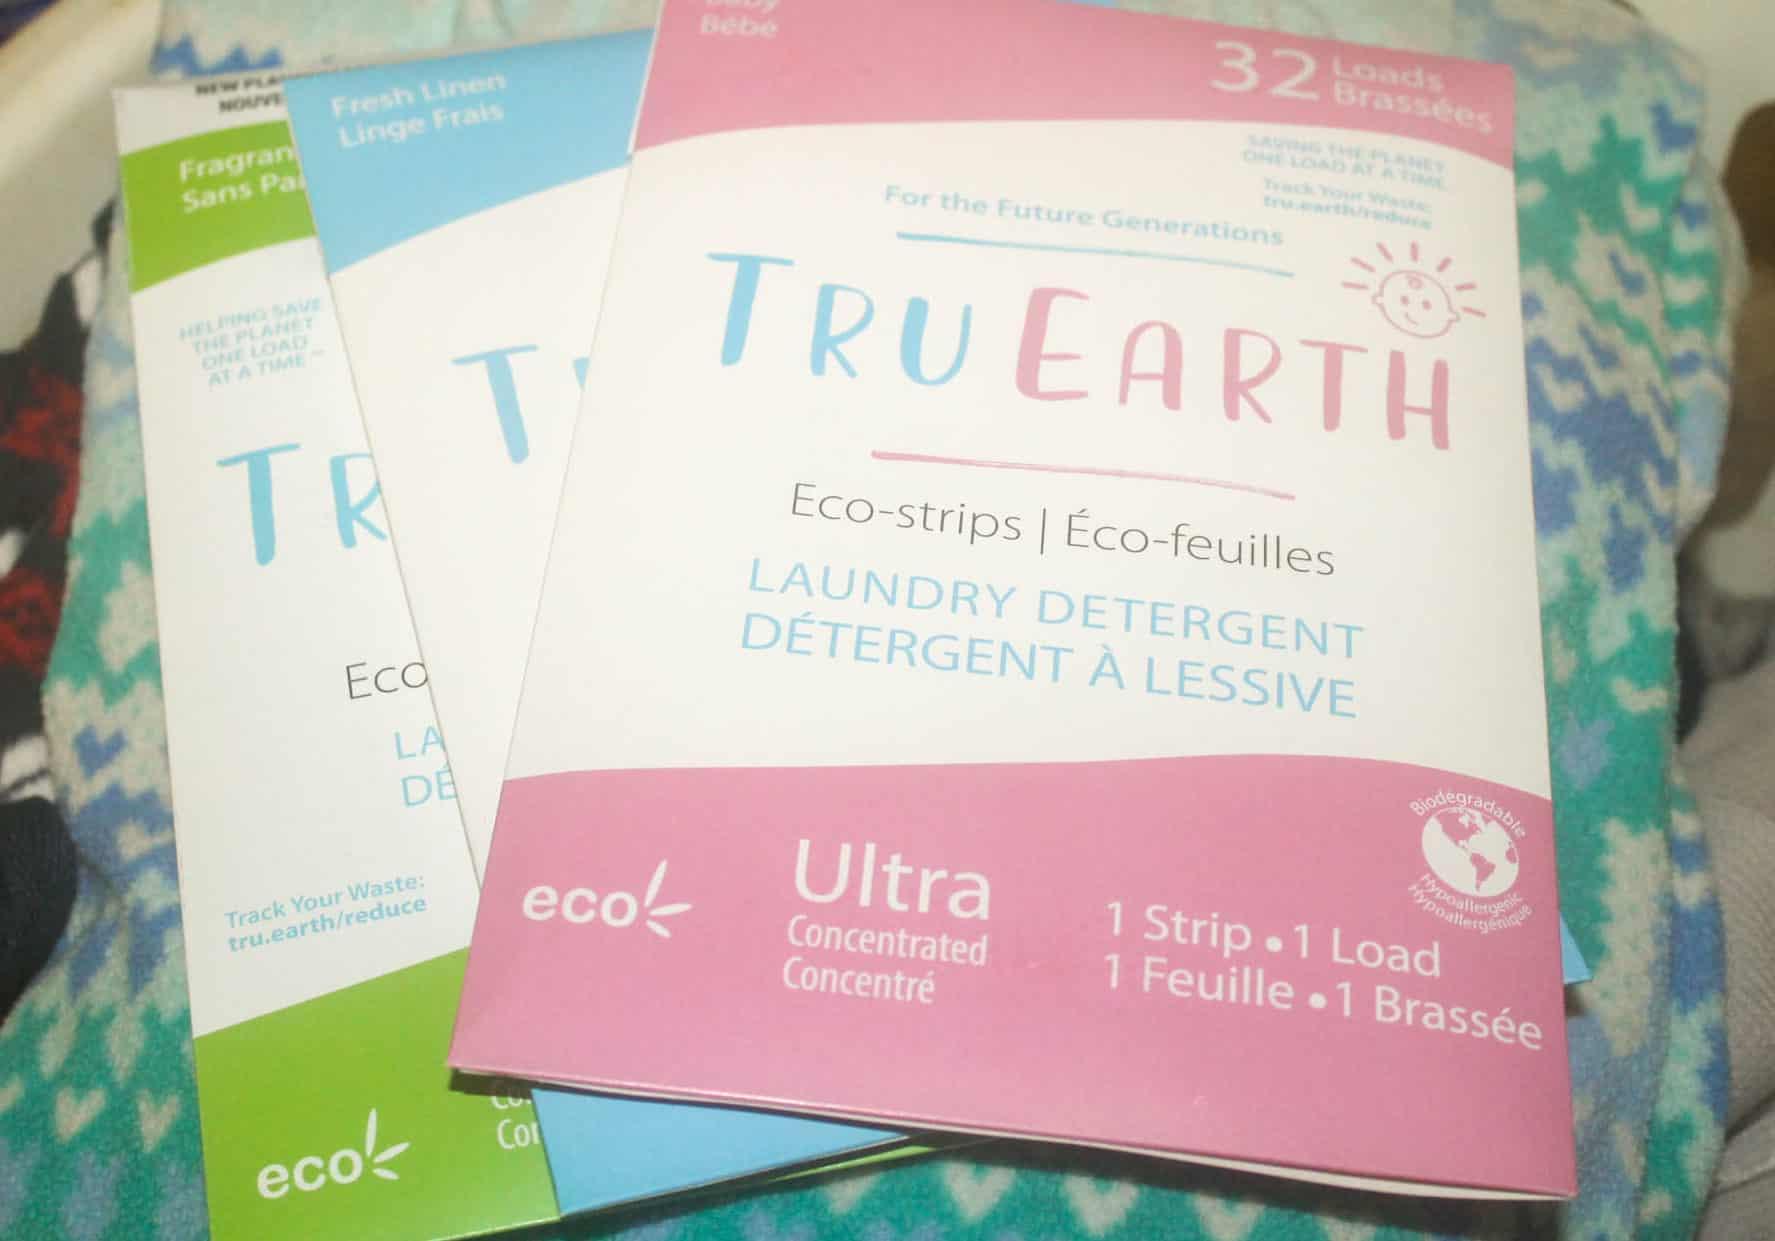 Tru Earth Laundry Eco-Strips varieties